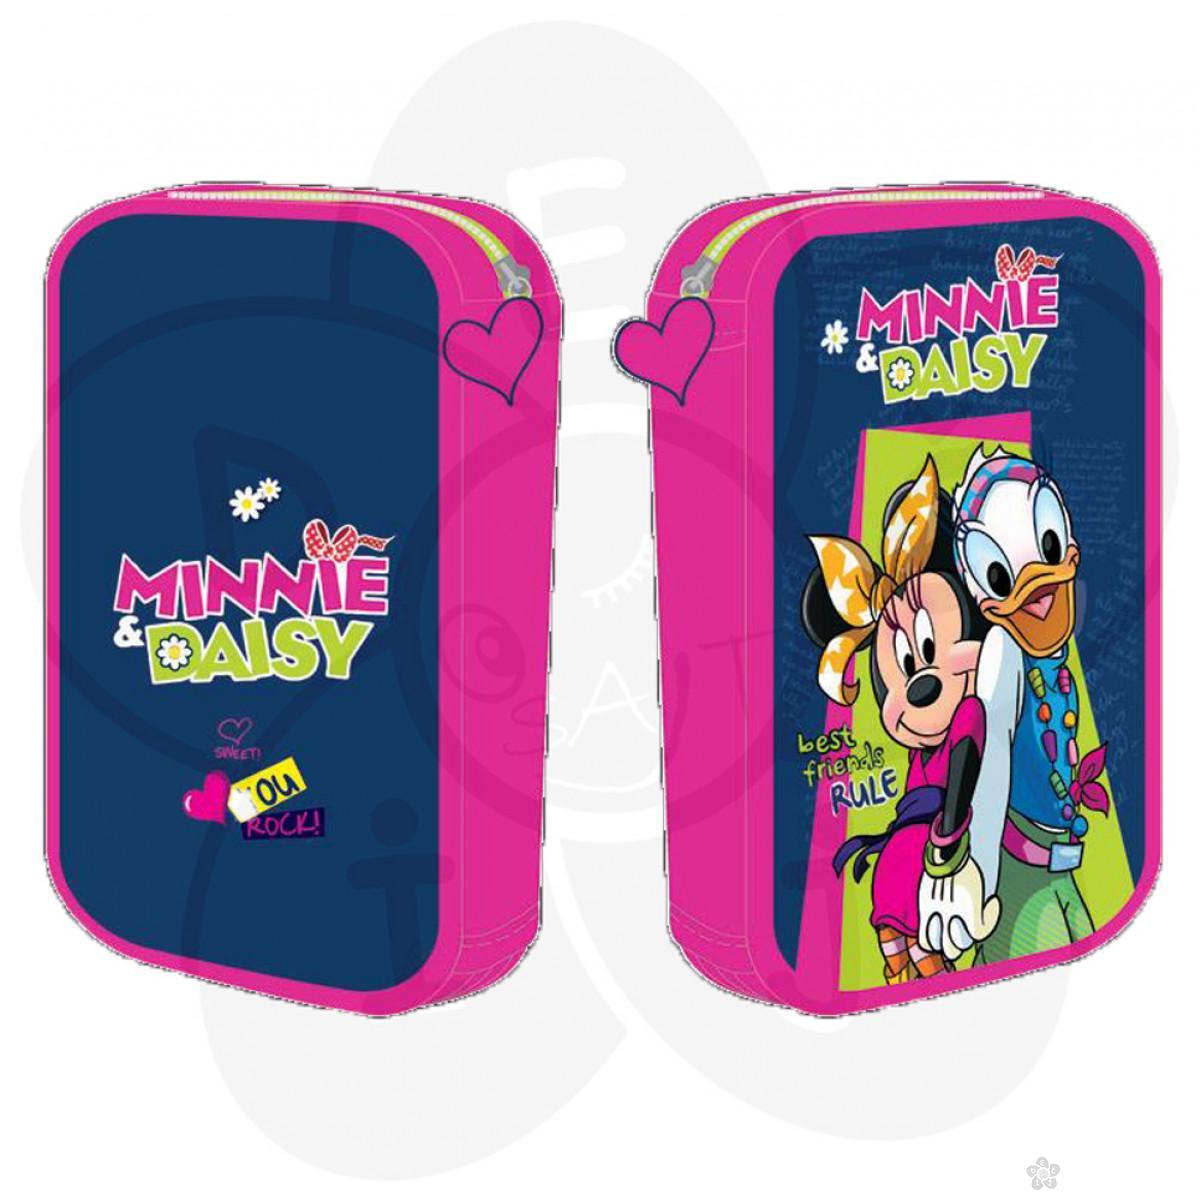 Dupla pernica - Minnie & Daisy